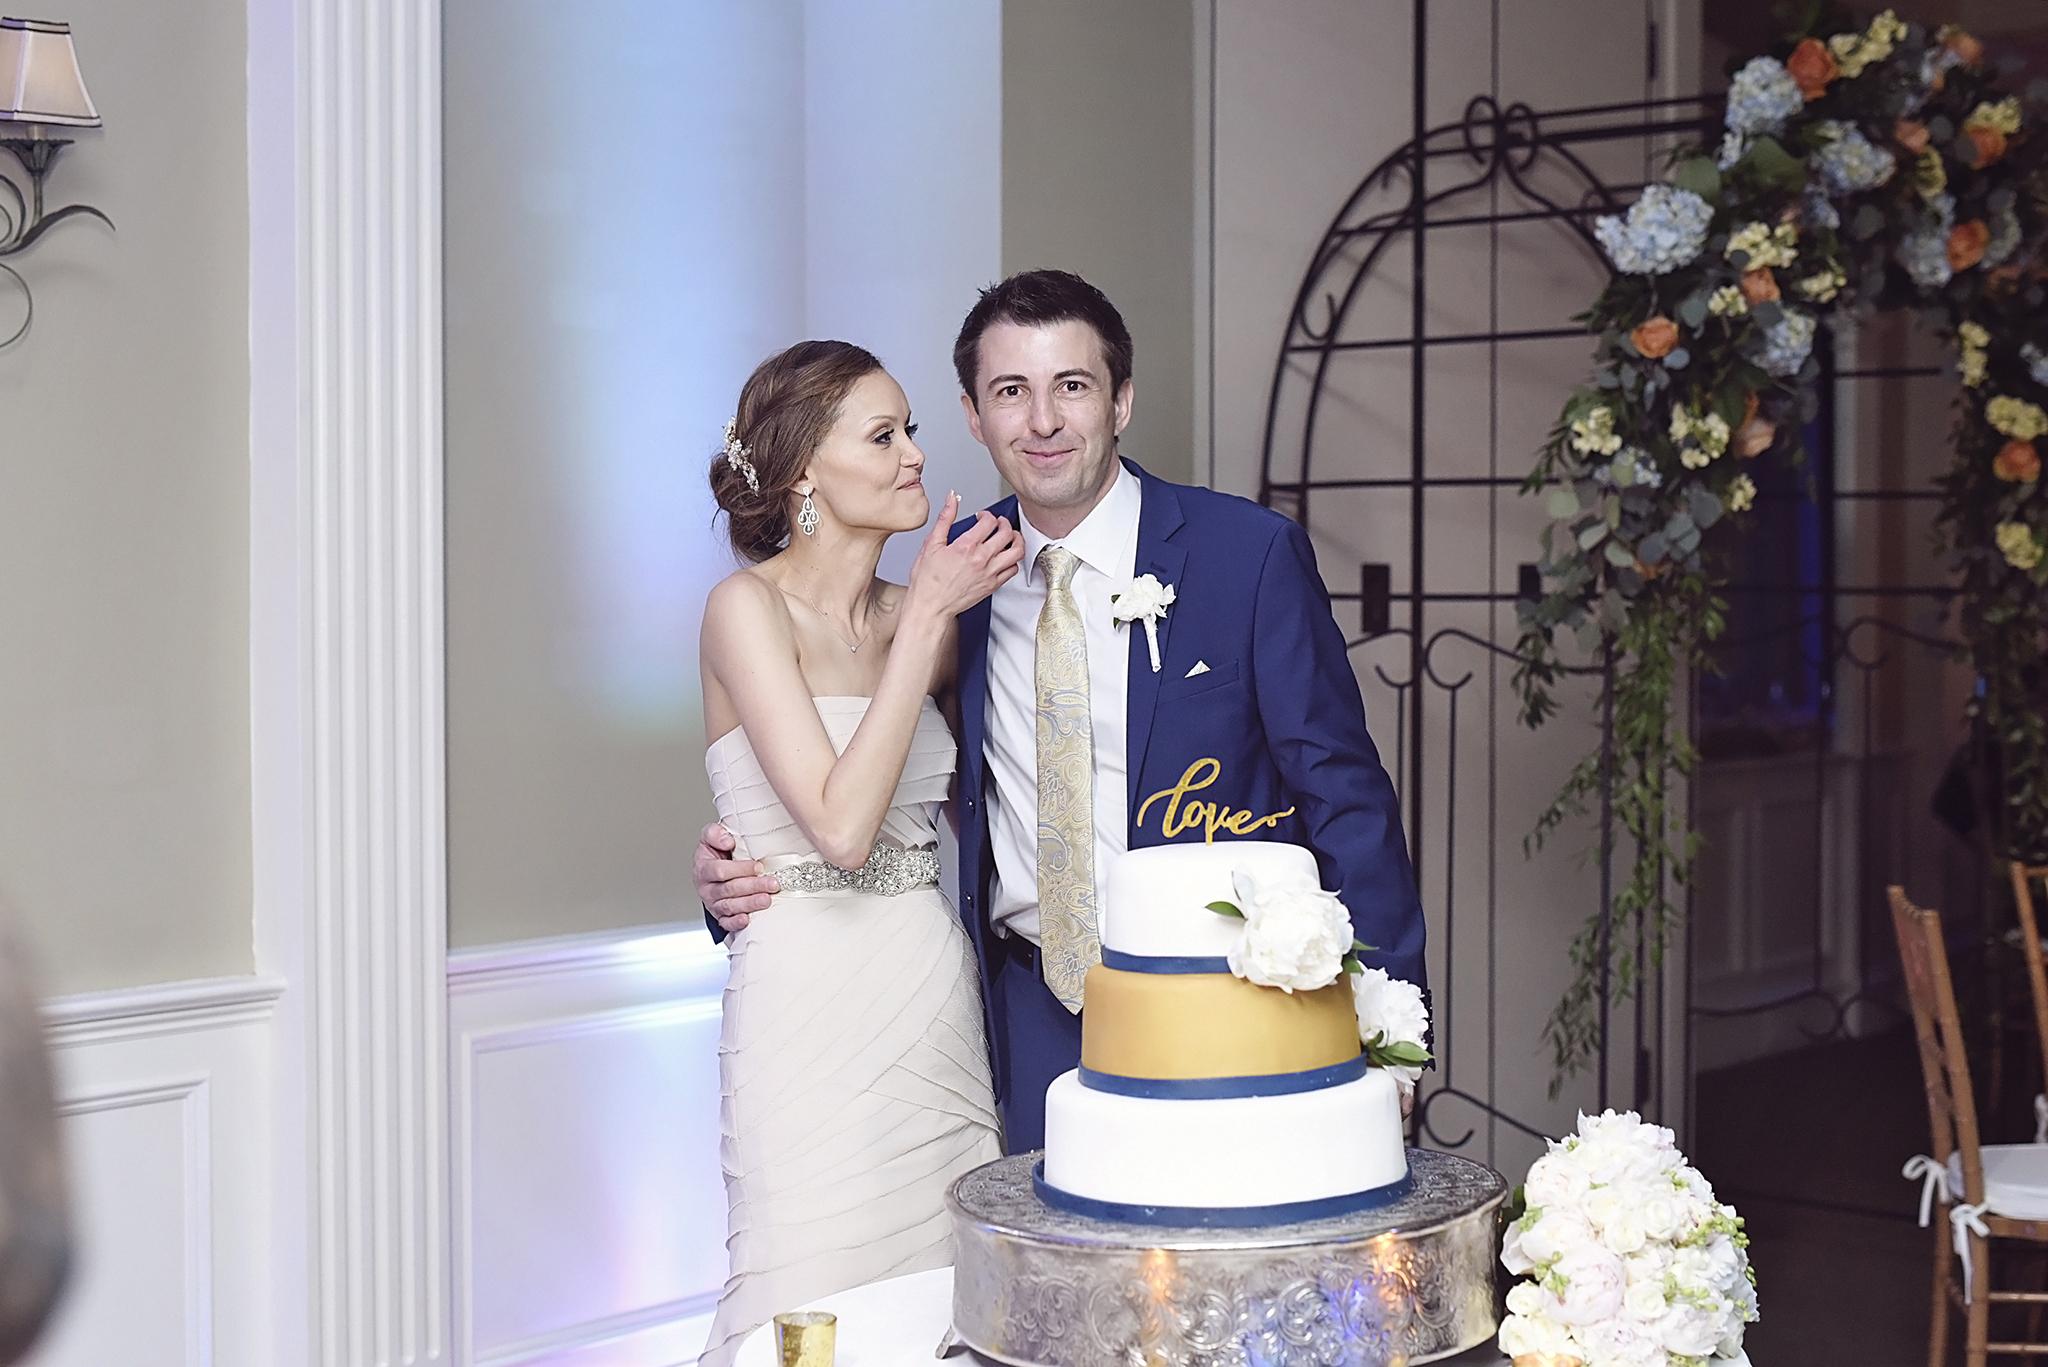 NJ-NY-wedding-photographer-168NJ-NY-wedding-photographer-168NJ-NY-WEDDING-PHOTOGRAPHER-168.JPG